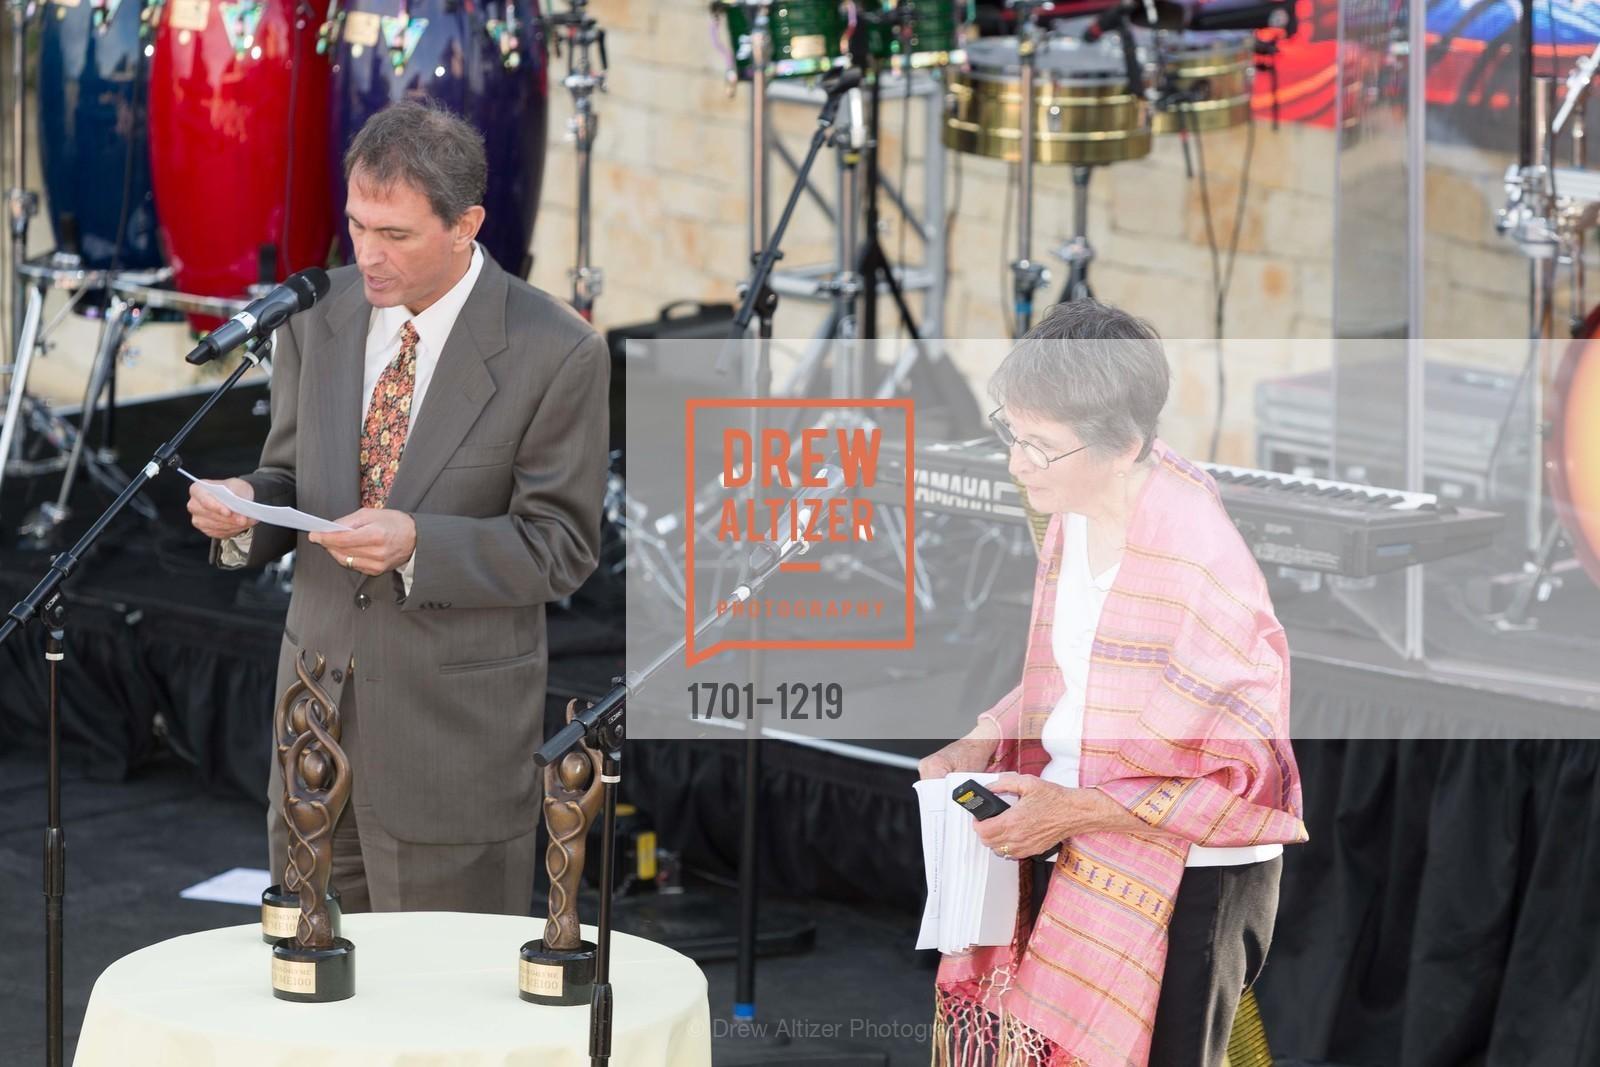 Larry Cagan, Phyllis Mervine, Photo #1701-1219